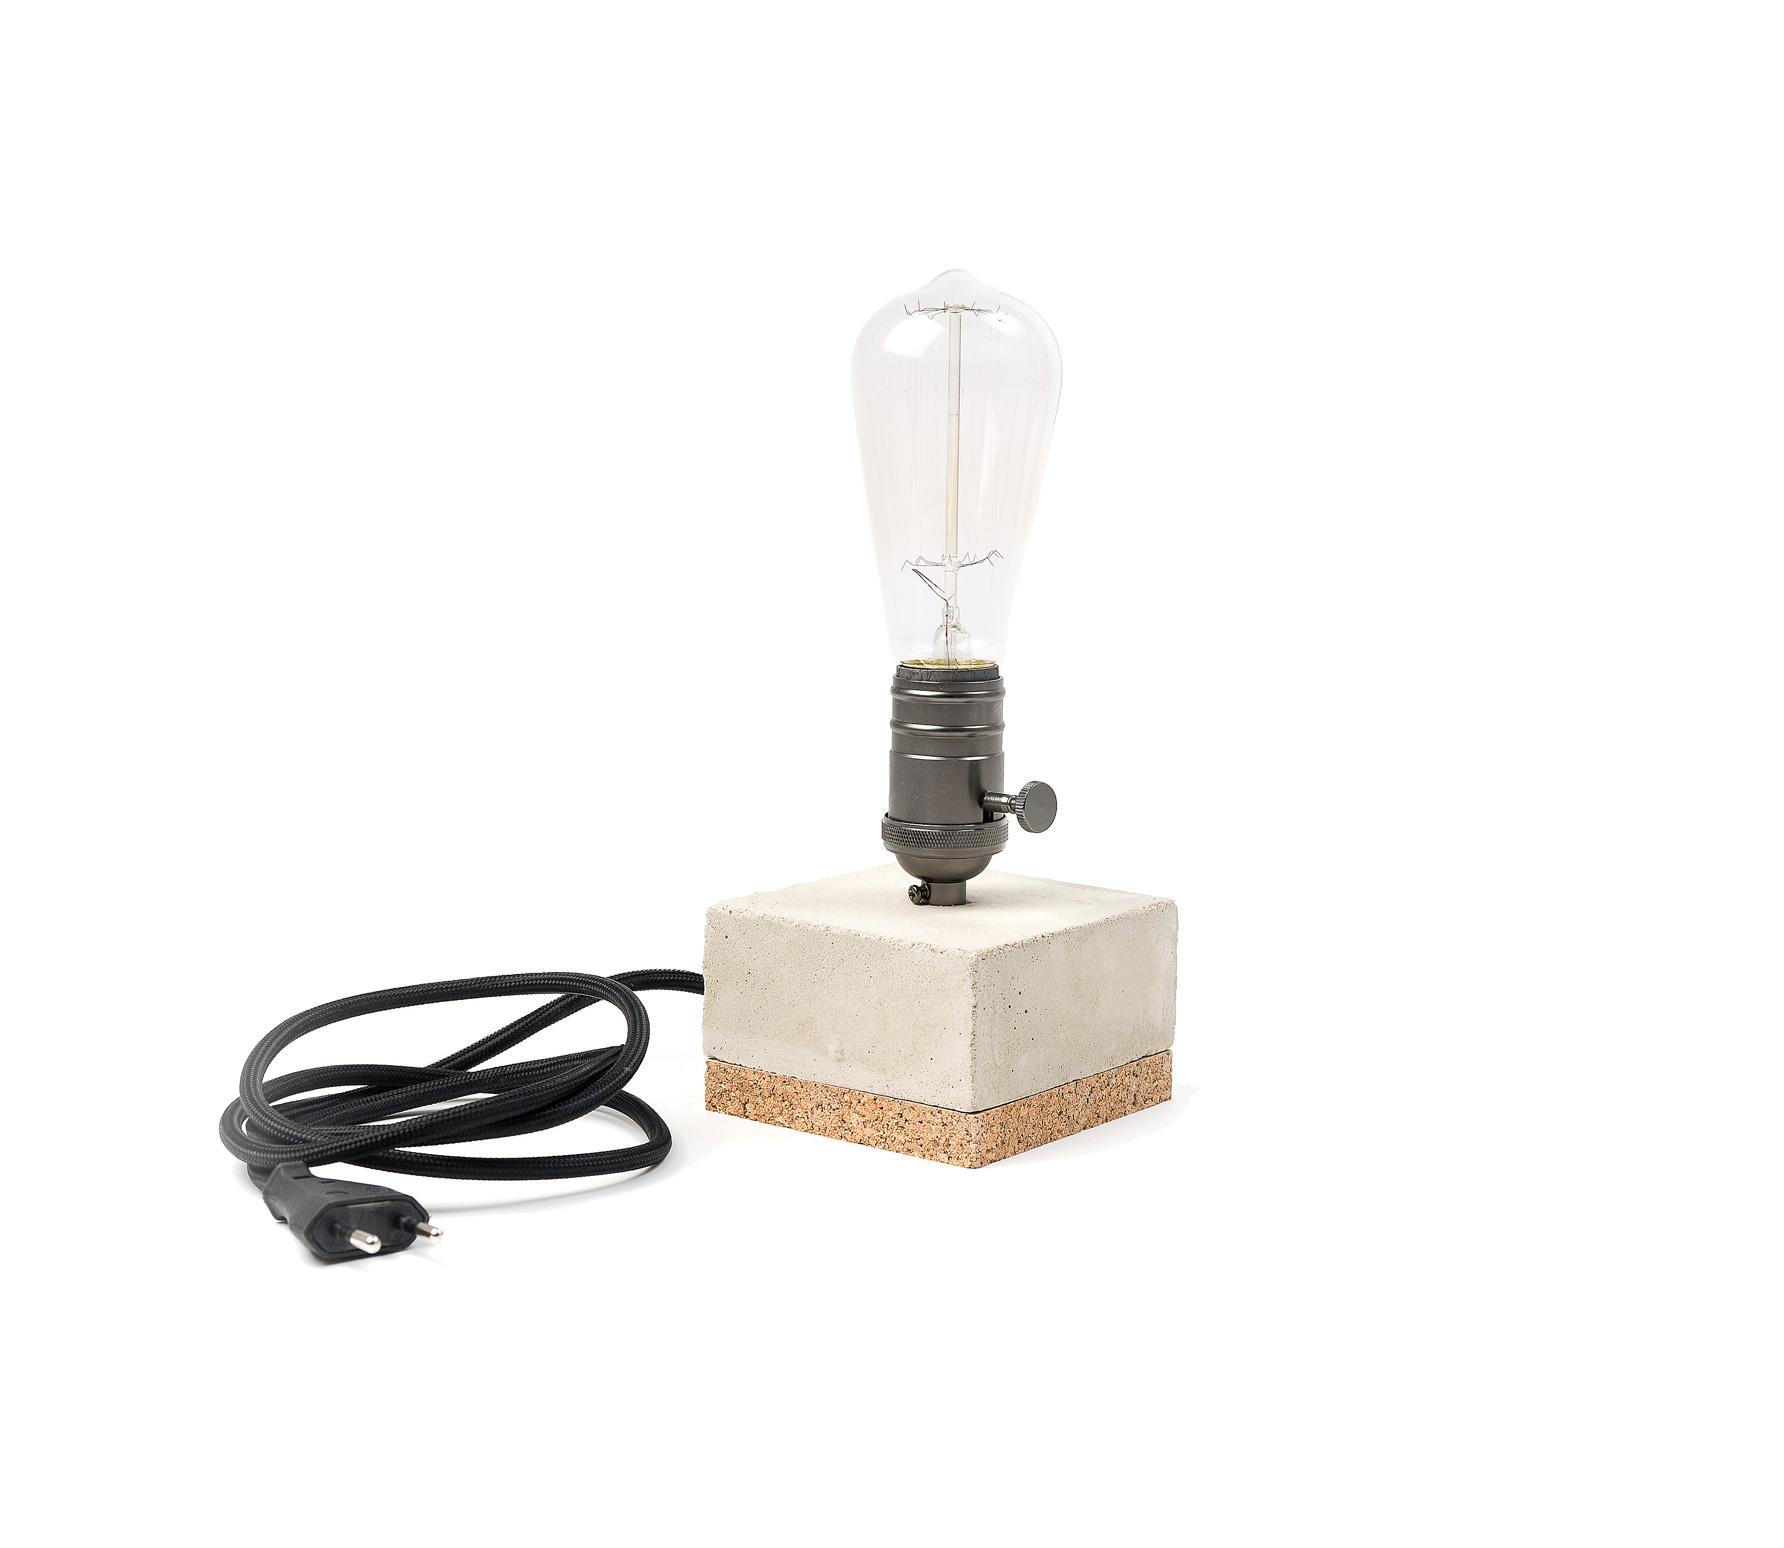 Edison tafellamp zwart incl lamp Zwart